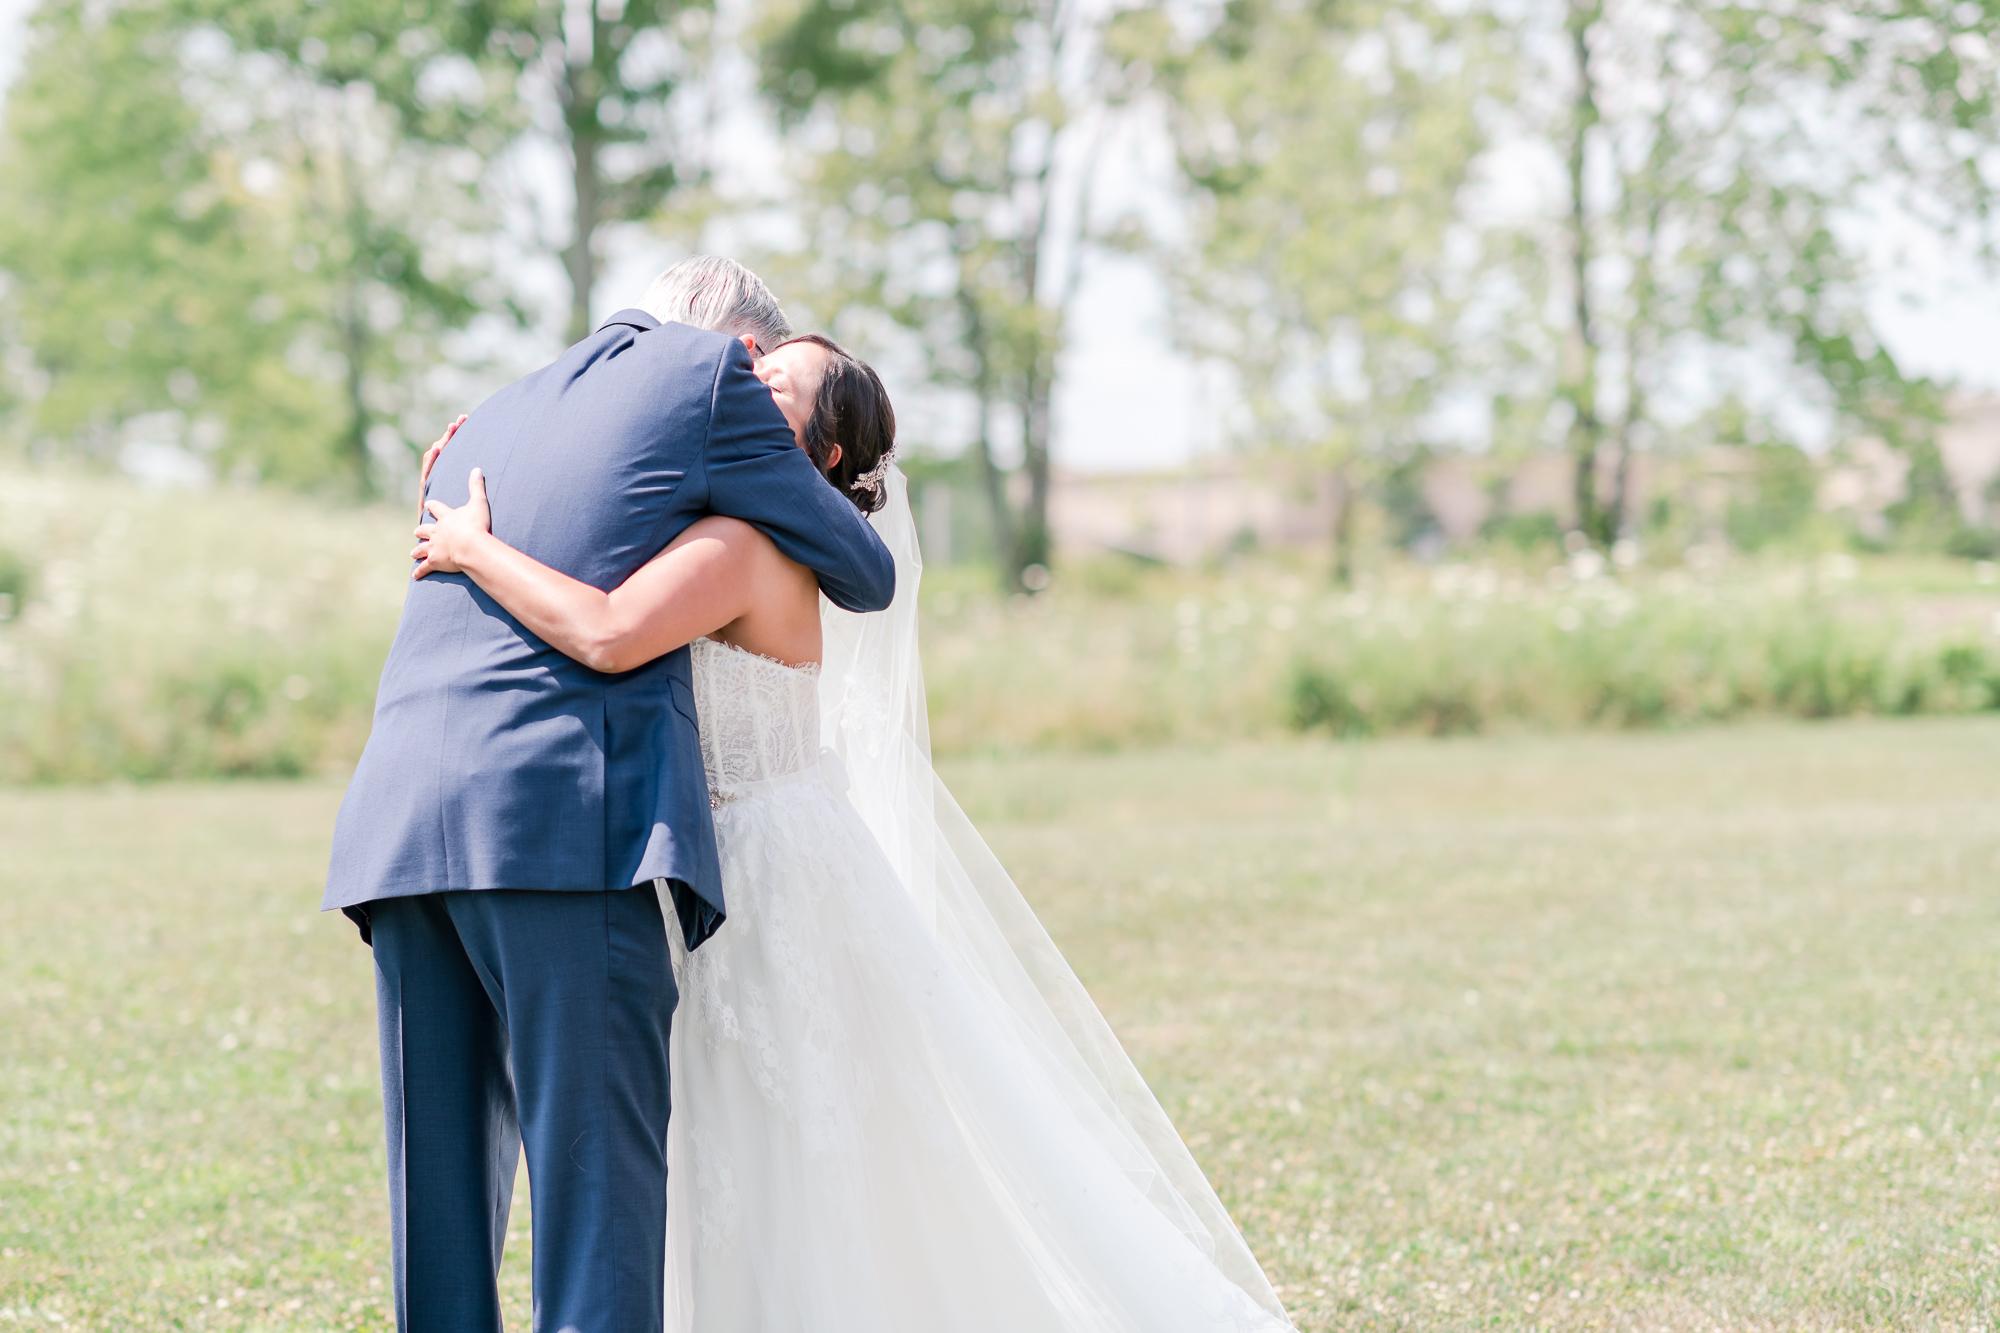 Maria+Adam_Summer Barn Wedding_The Barn at The North Star Preserve_Oberlin_Ohio-71.jpg